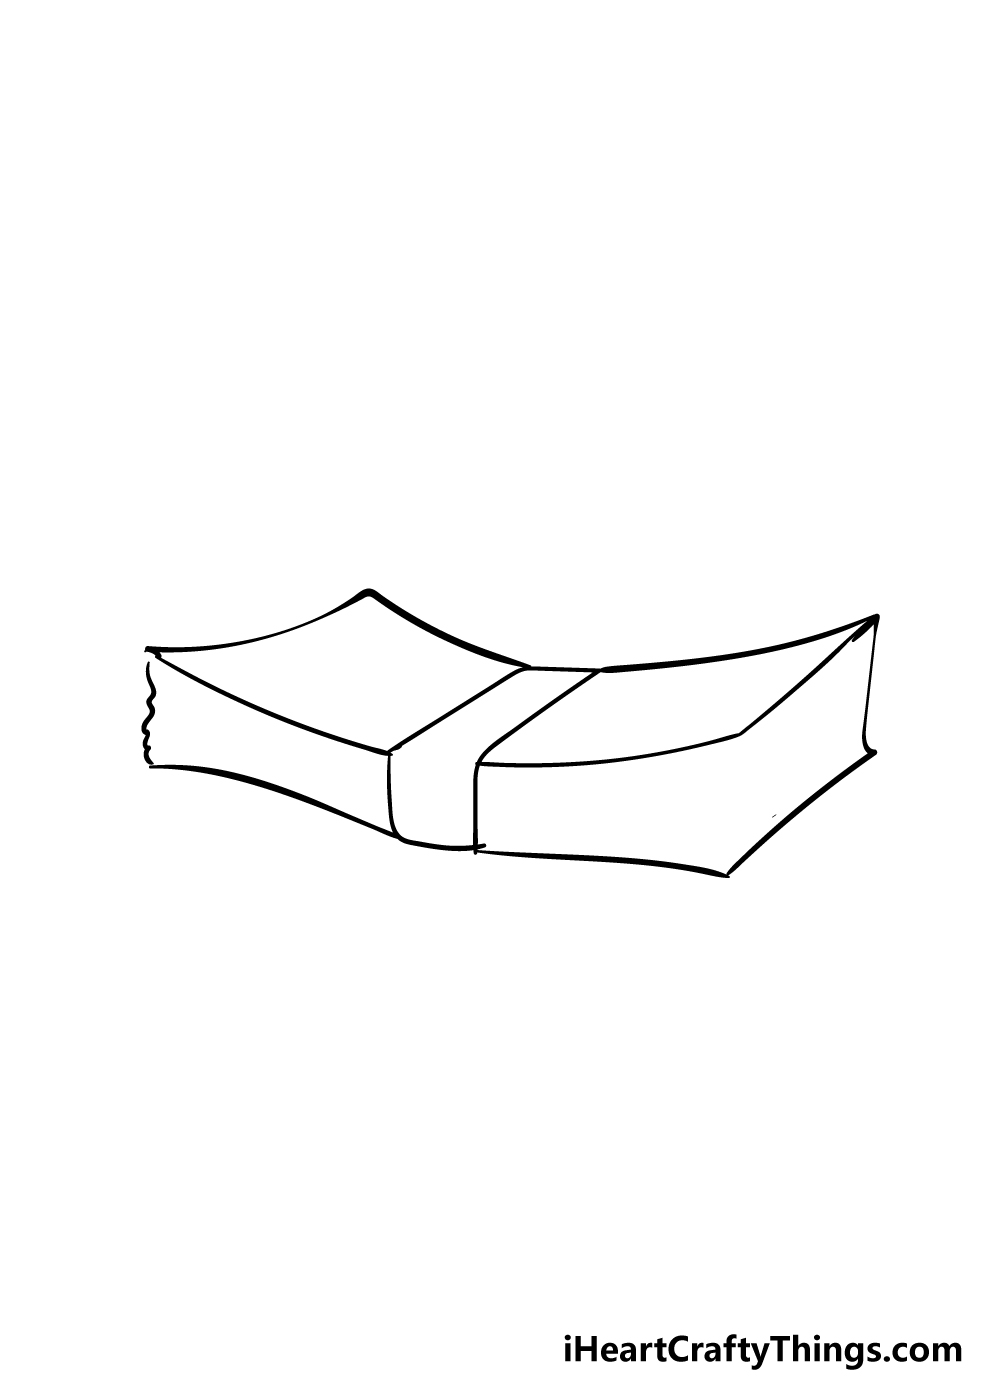 money drawing step 4